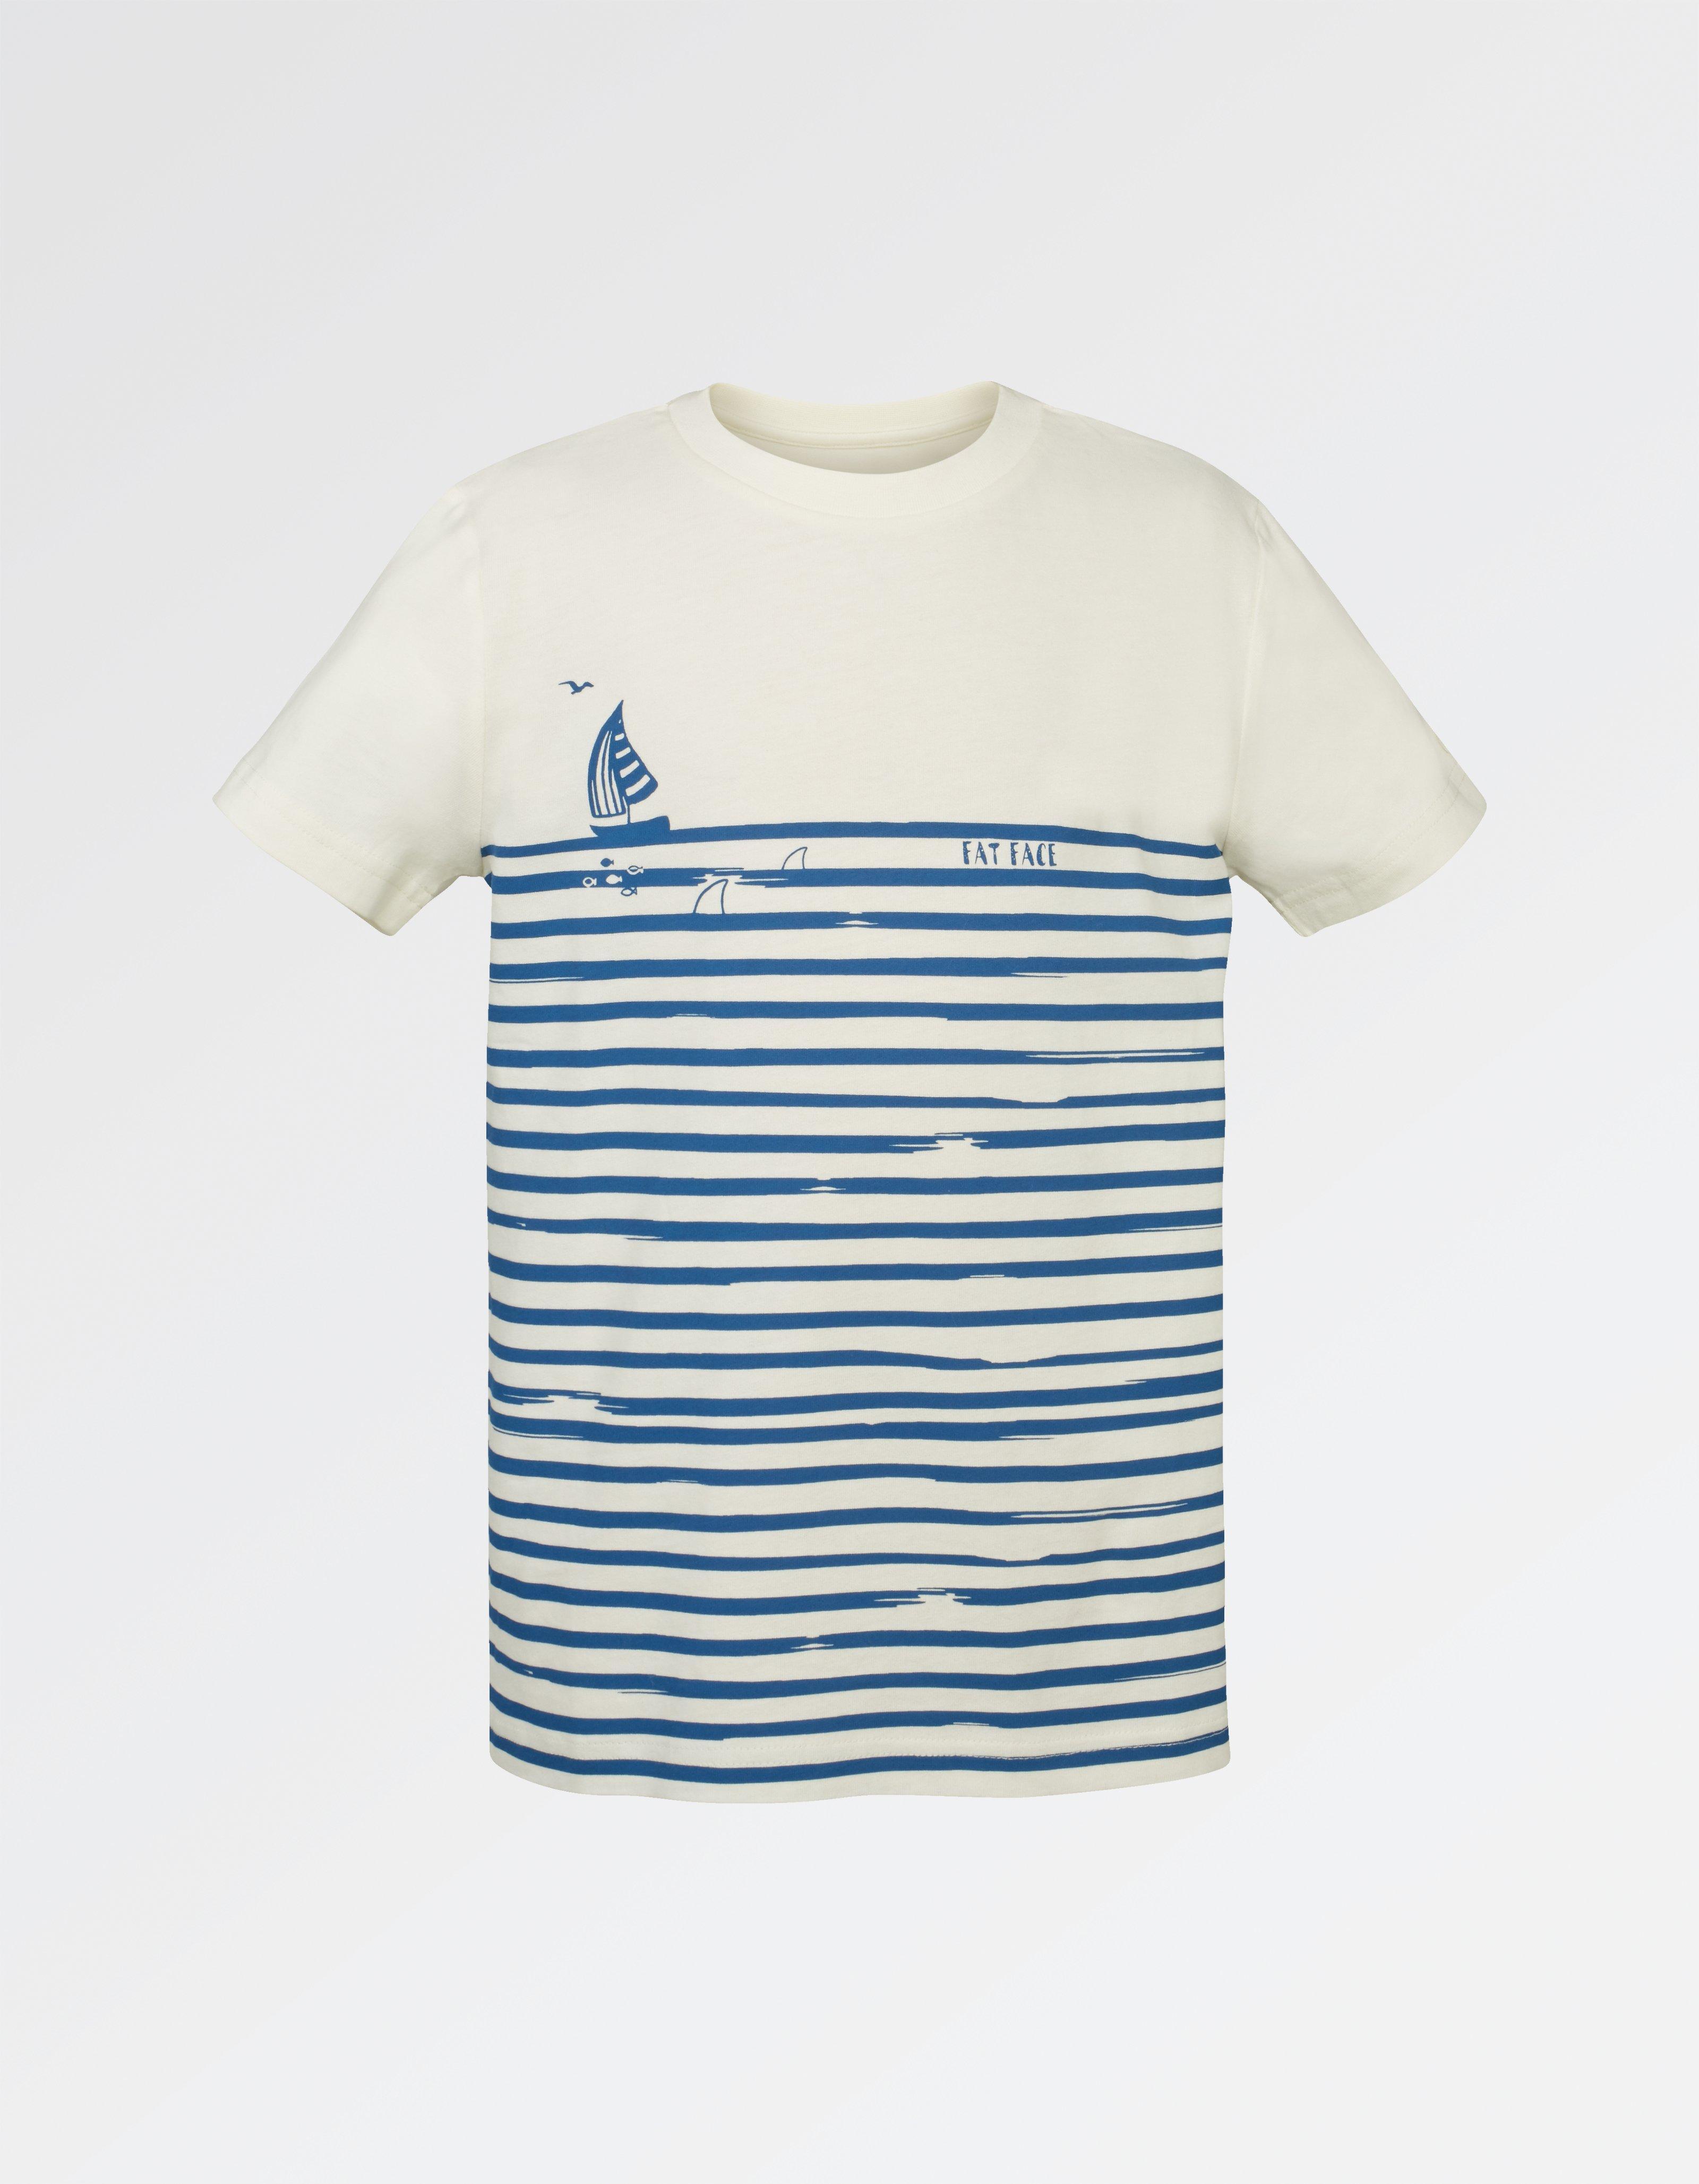 Stripe Sailing Graphic T Shirt